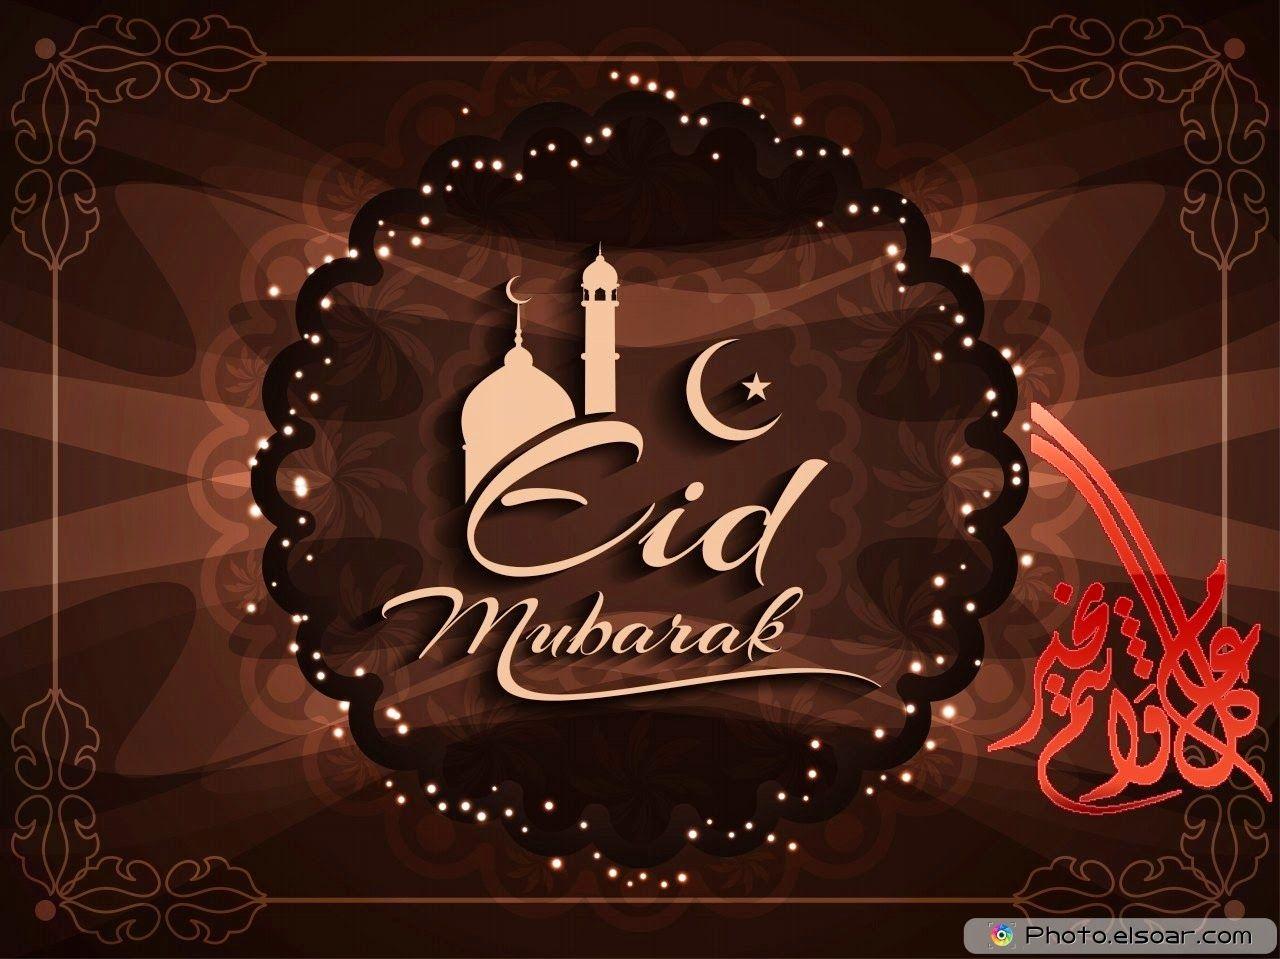 Eid mubarak 2014 wallpapers eidmubarak wallpapers eid mubarak eid mubarak 2014 wallpapers eidmubarak wallpapers kristyandbryce Choice Image